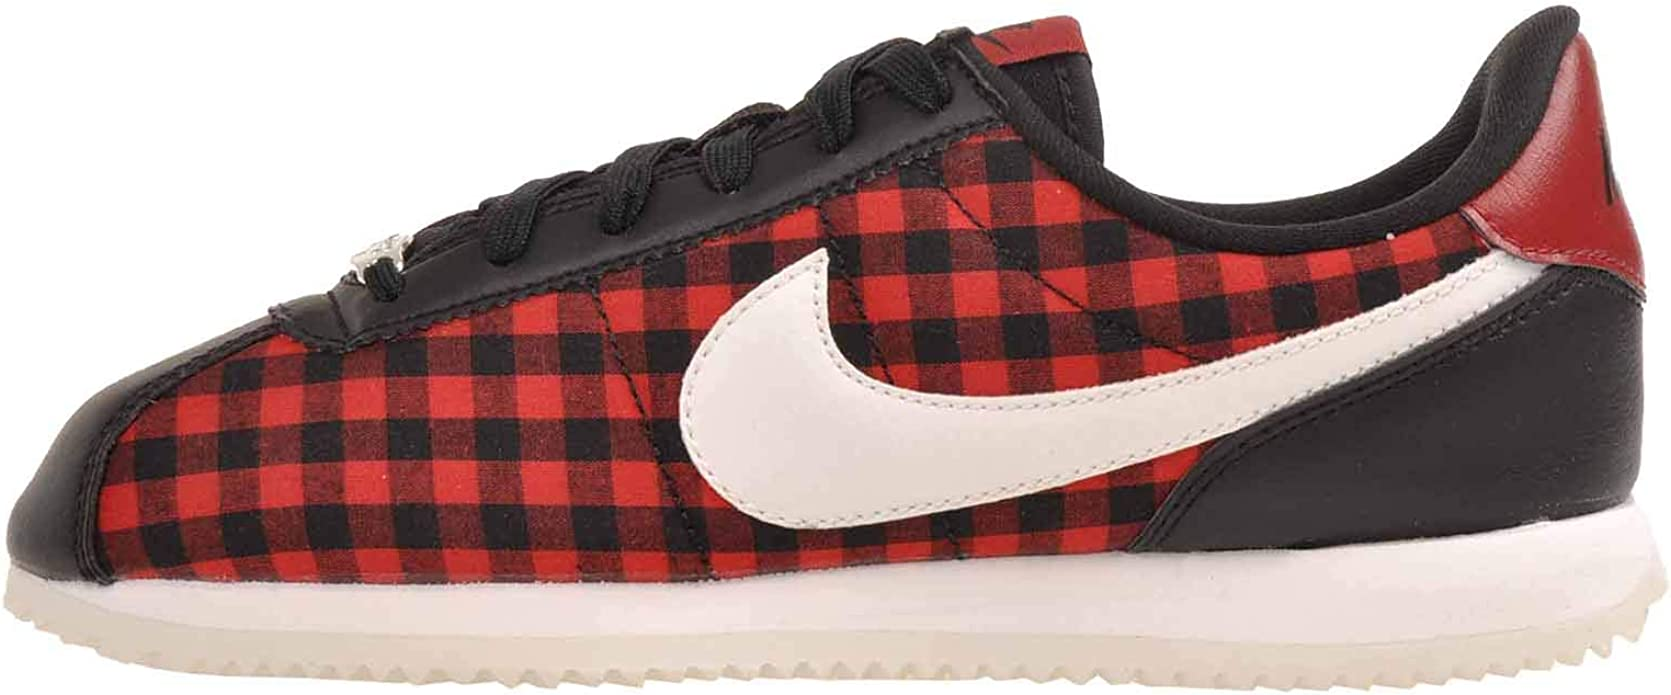 Apariencia Sede Pompeya  Amazon.com: Nike Cortez Basic TXT SE (Plaid) (Kids): Shoes